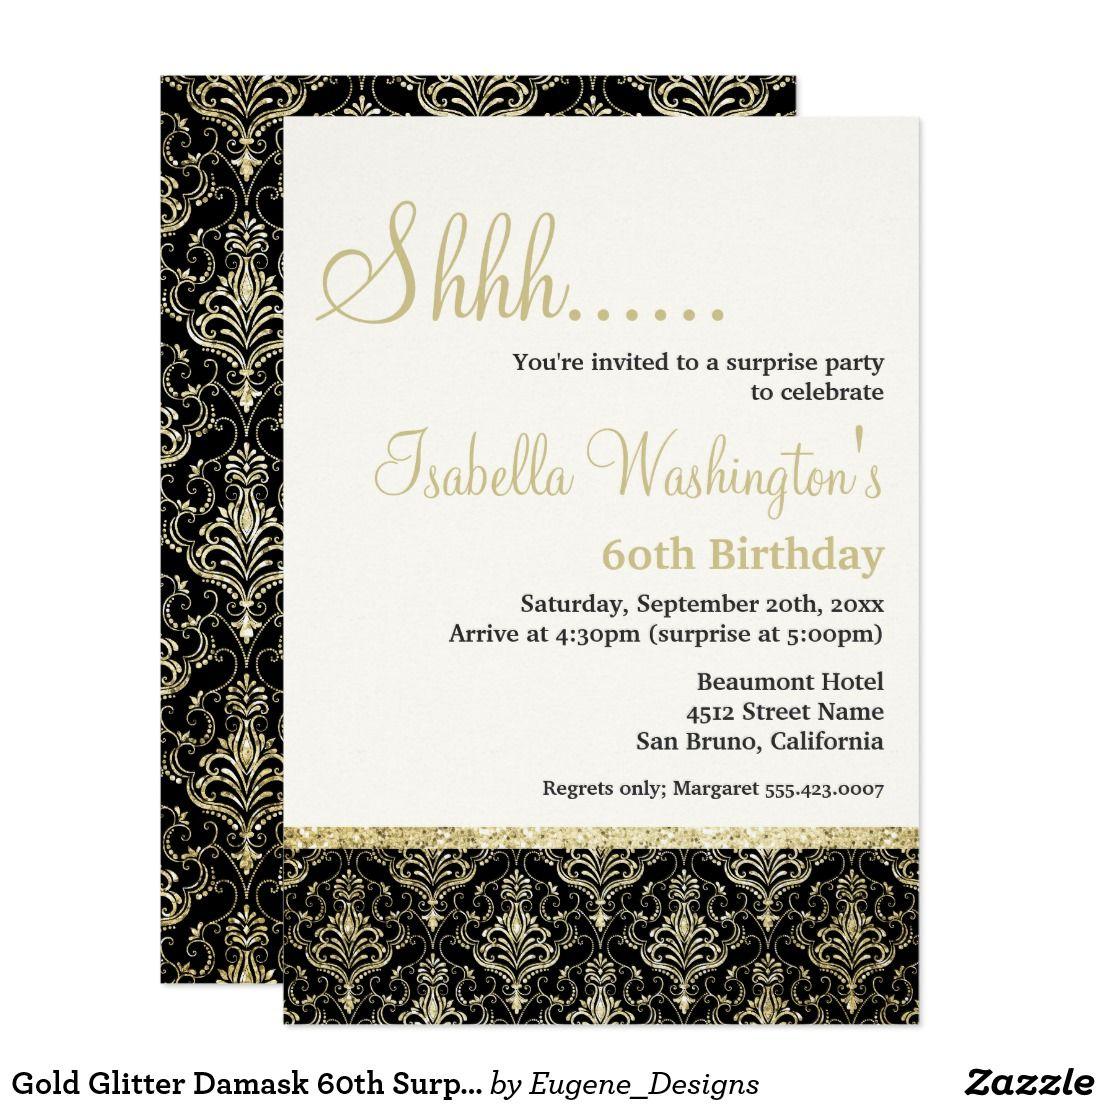 Gold Glitter Damask 60th Surprise Birthday Party Invitation ...